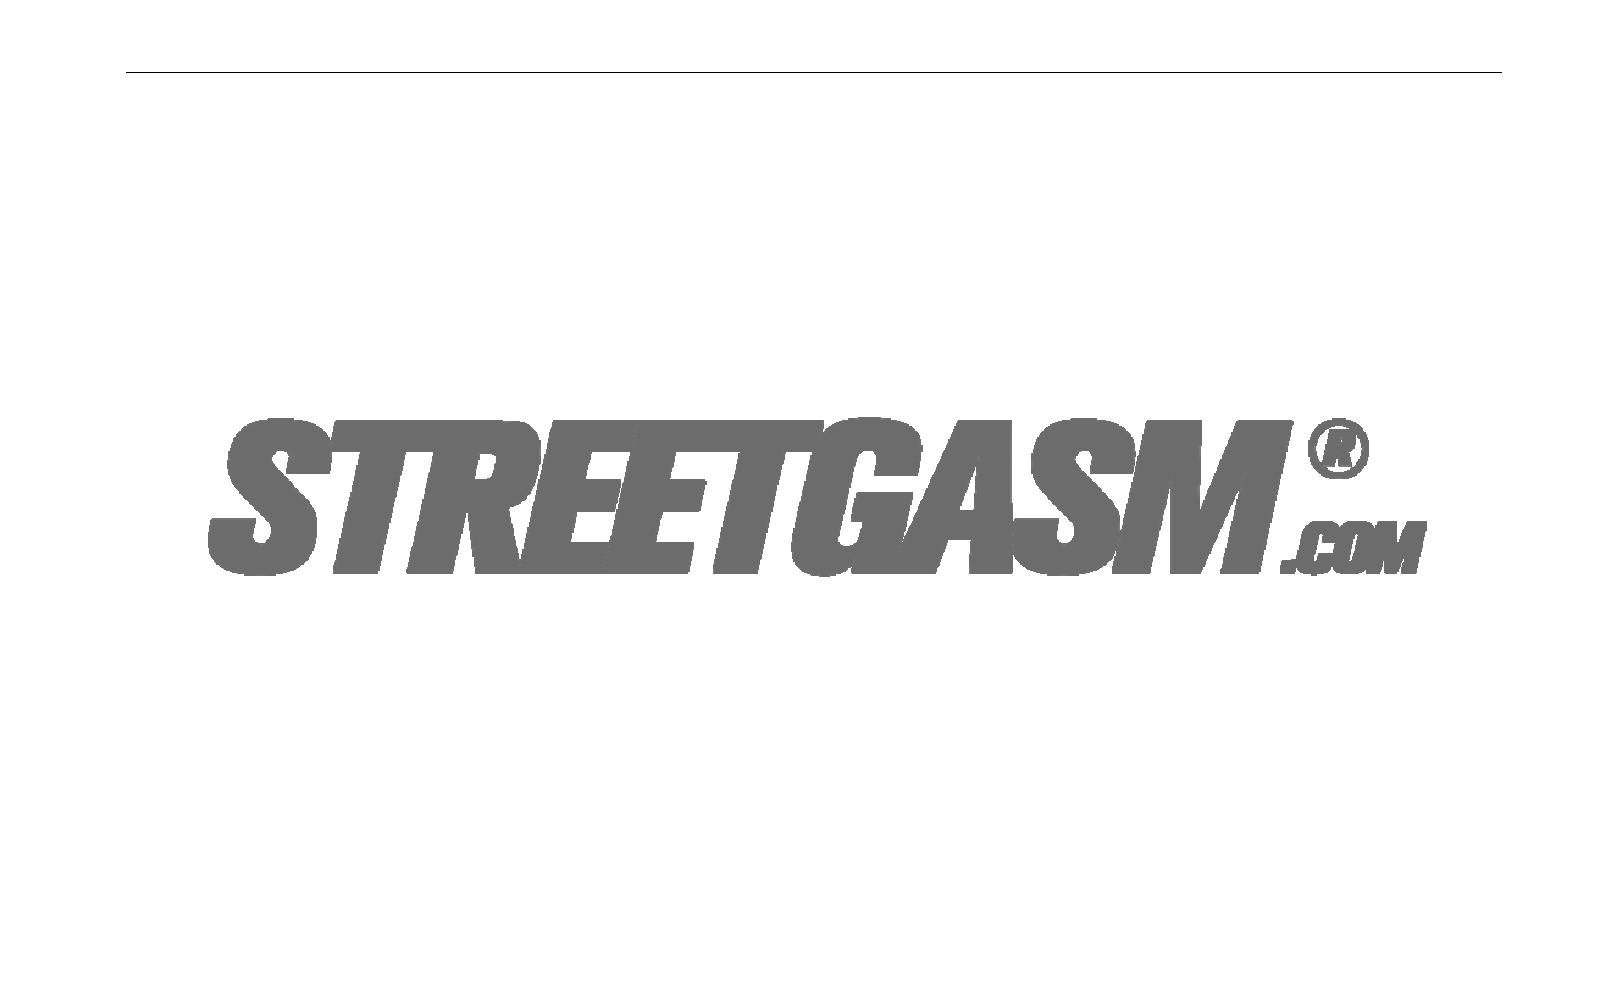 Streetgasm Airdome en bedrukte bogen EBS